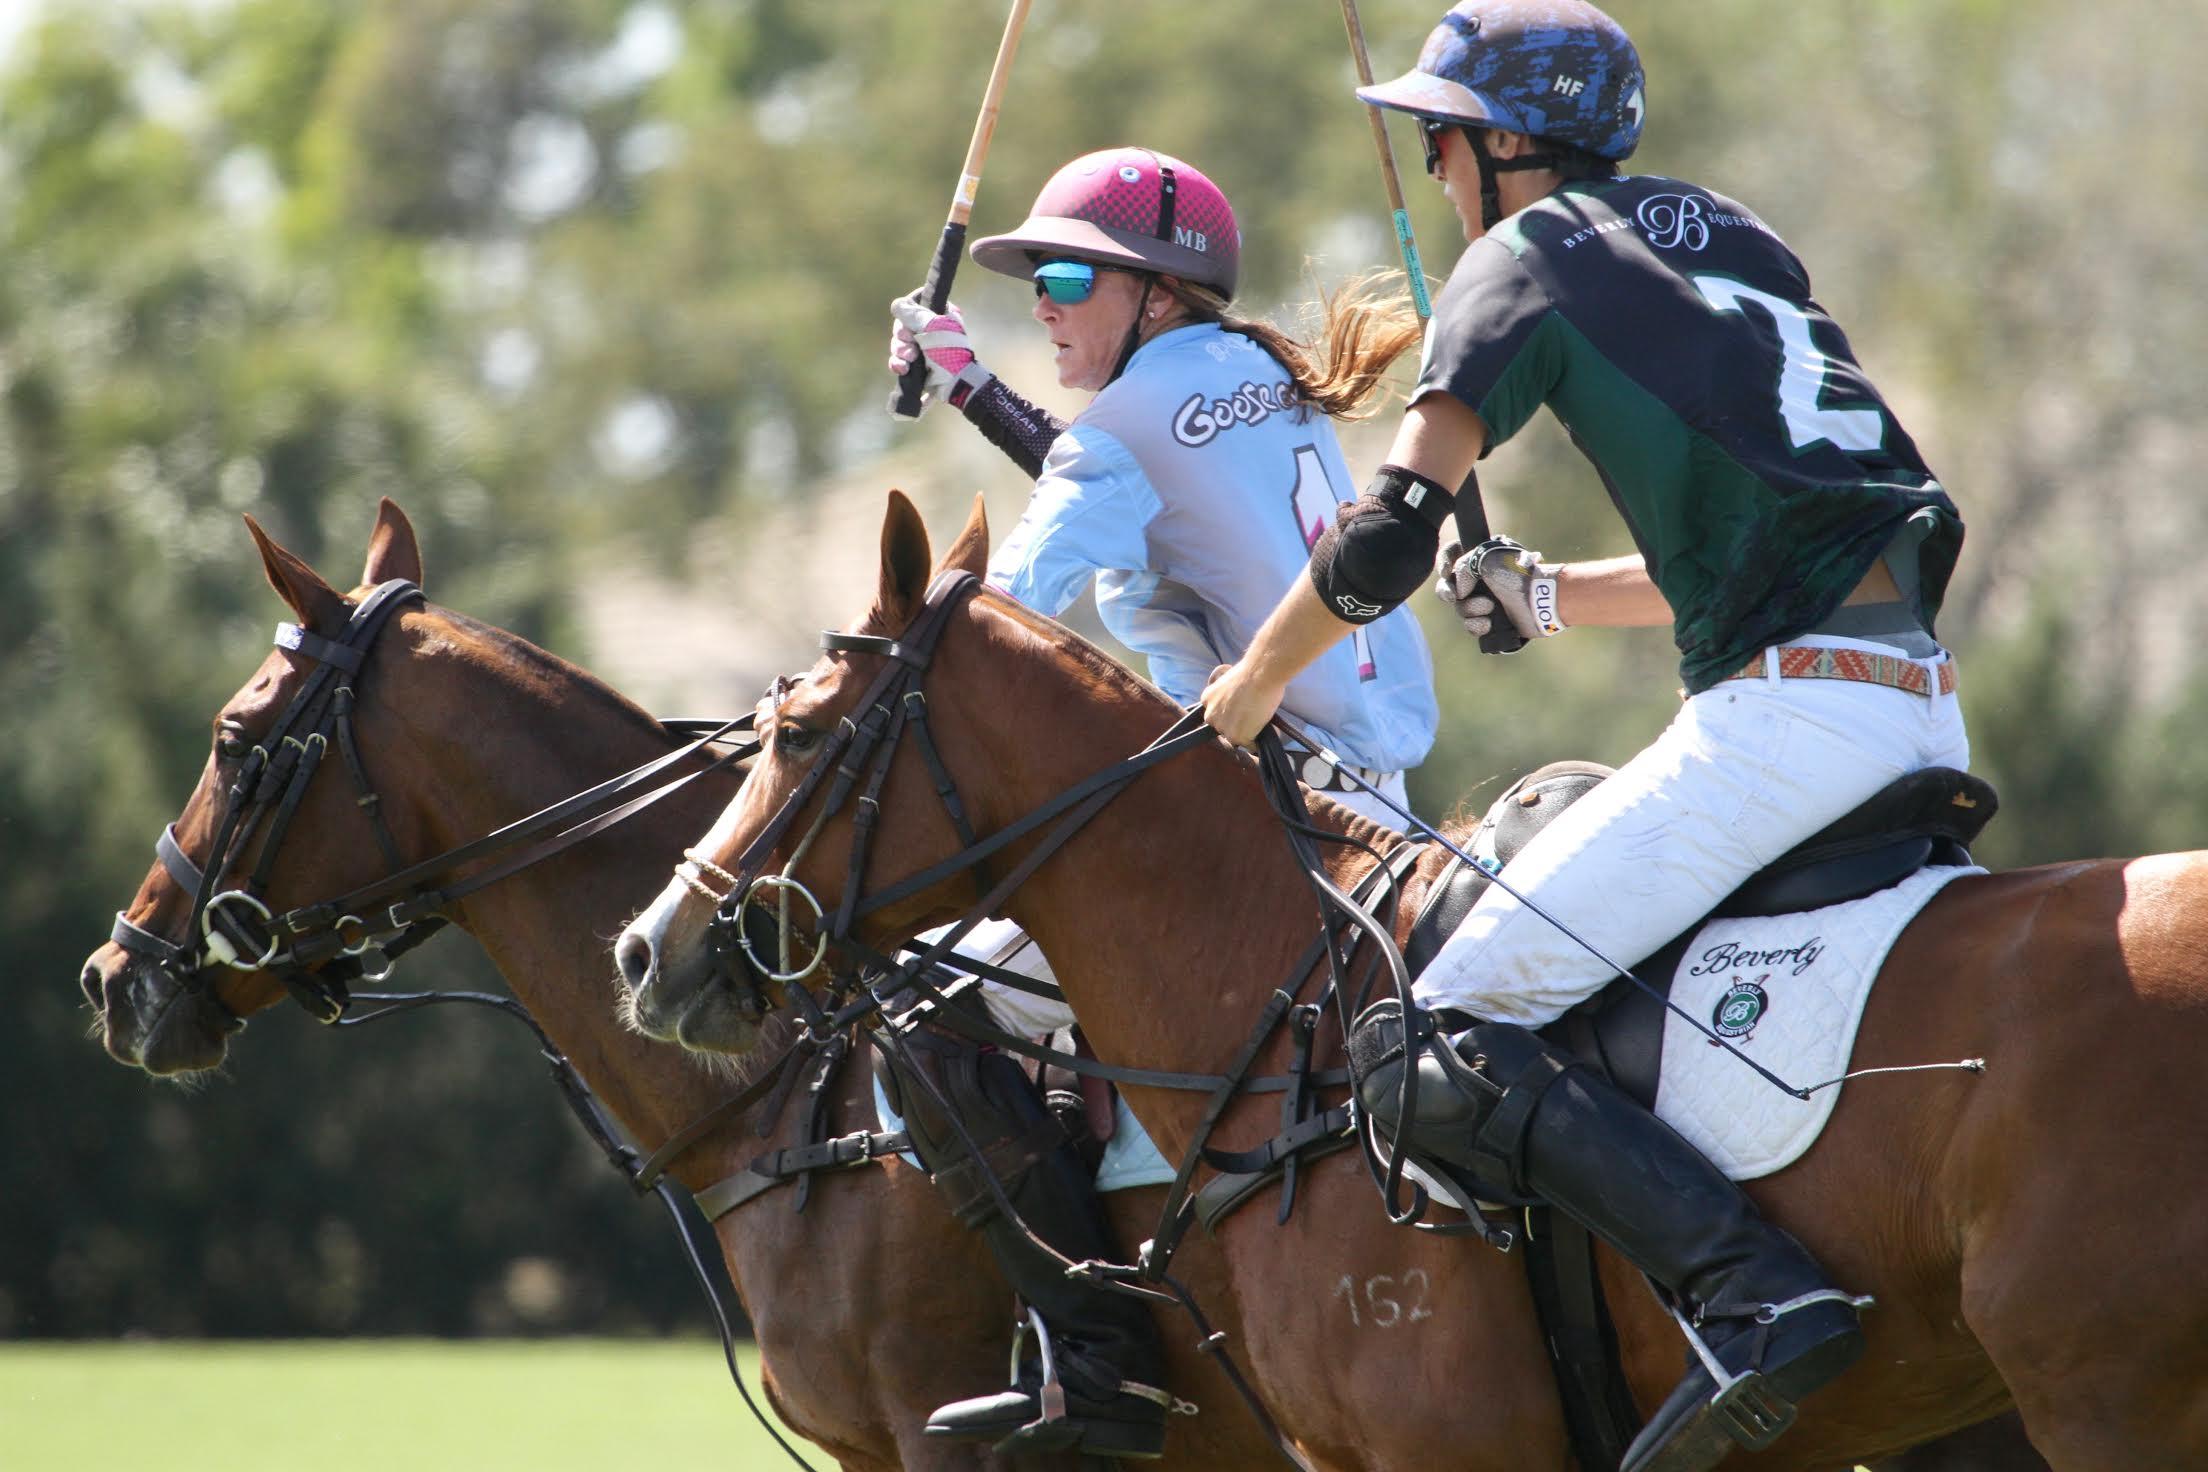 Hilario Figueras of Beverly Equestrian defends Maureen Brennan of Goose Creek/GSA.